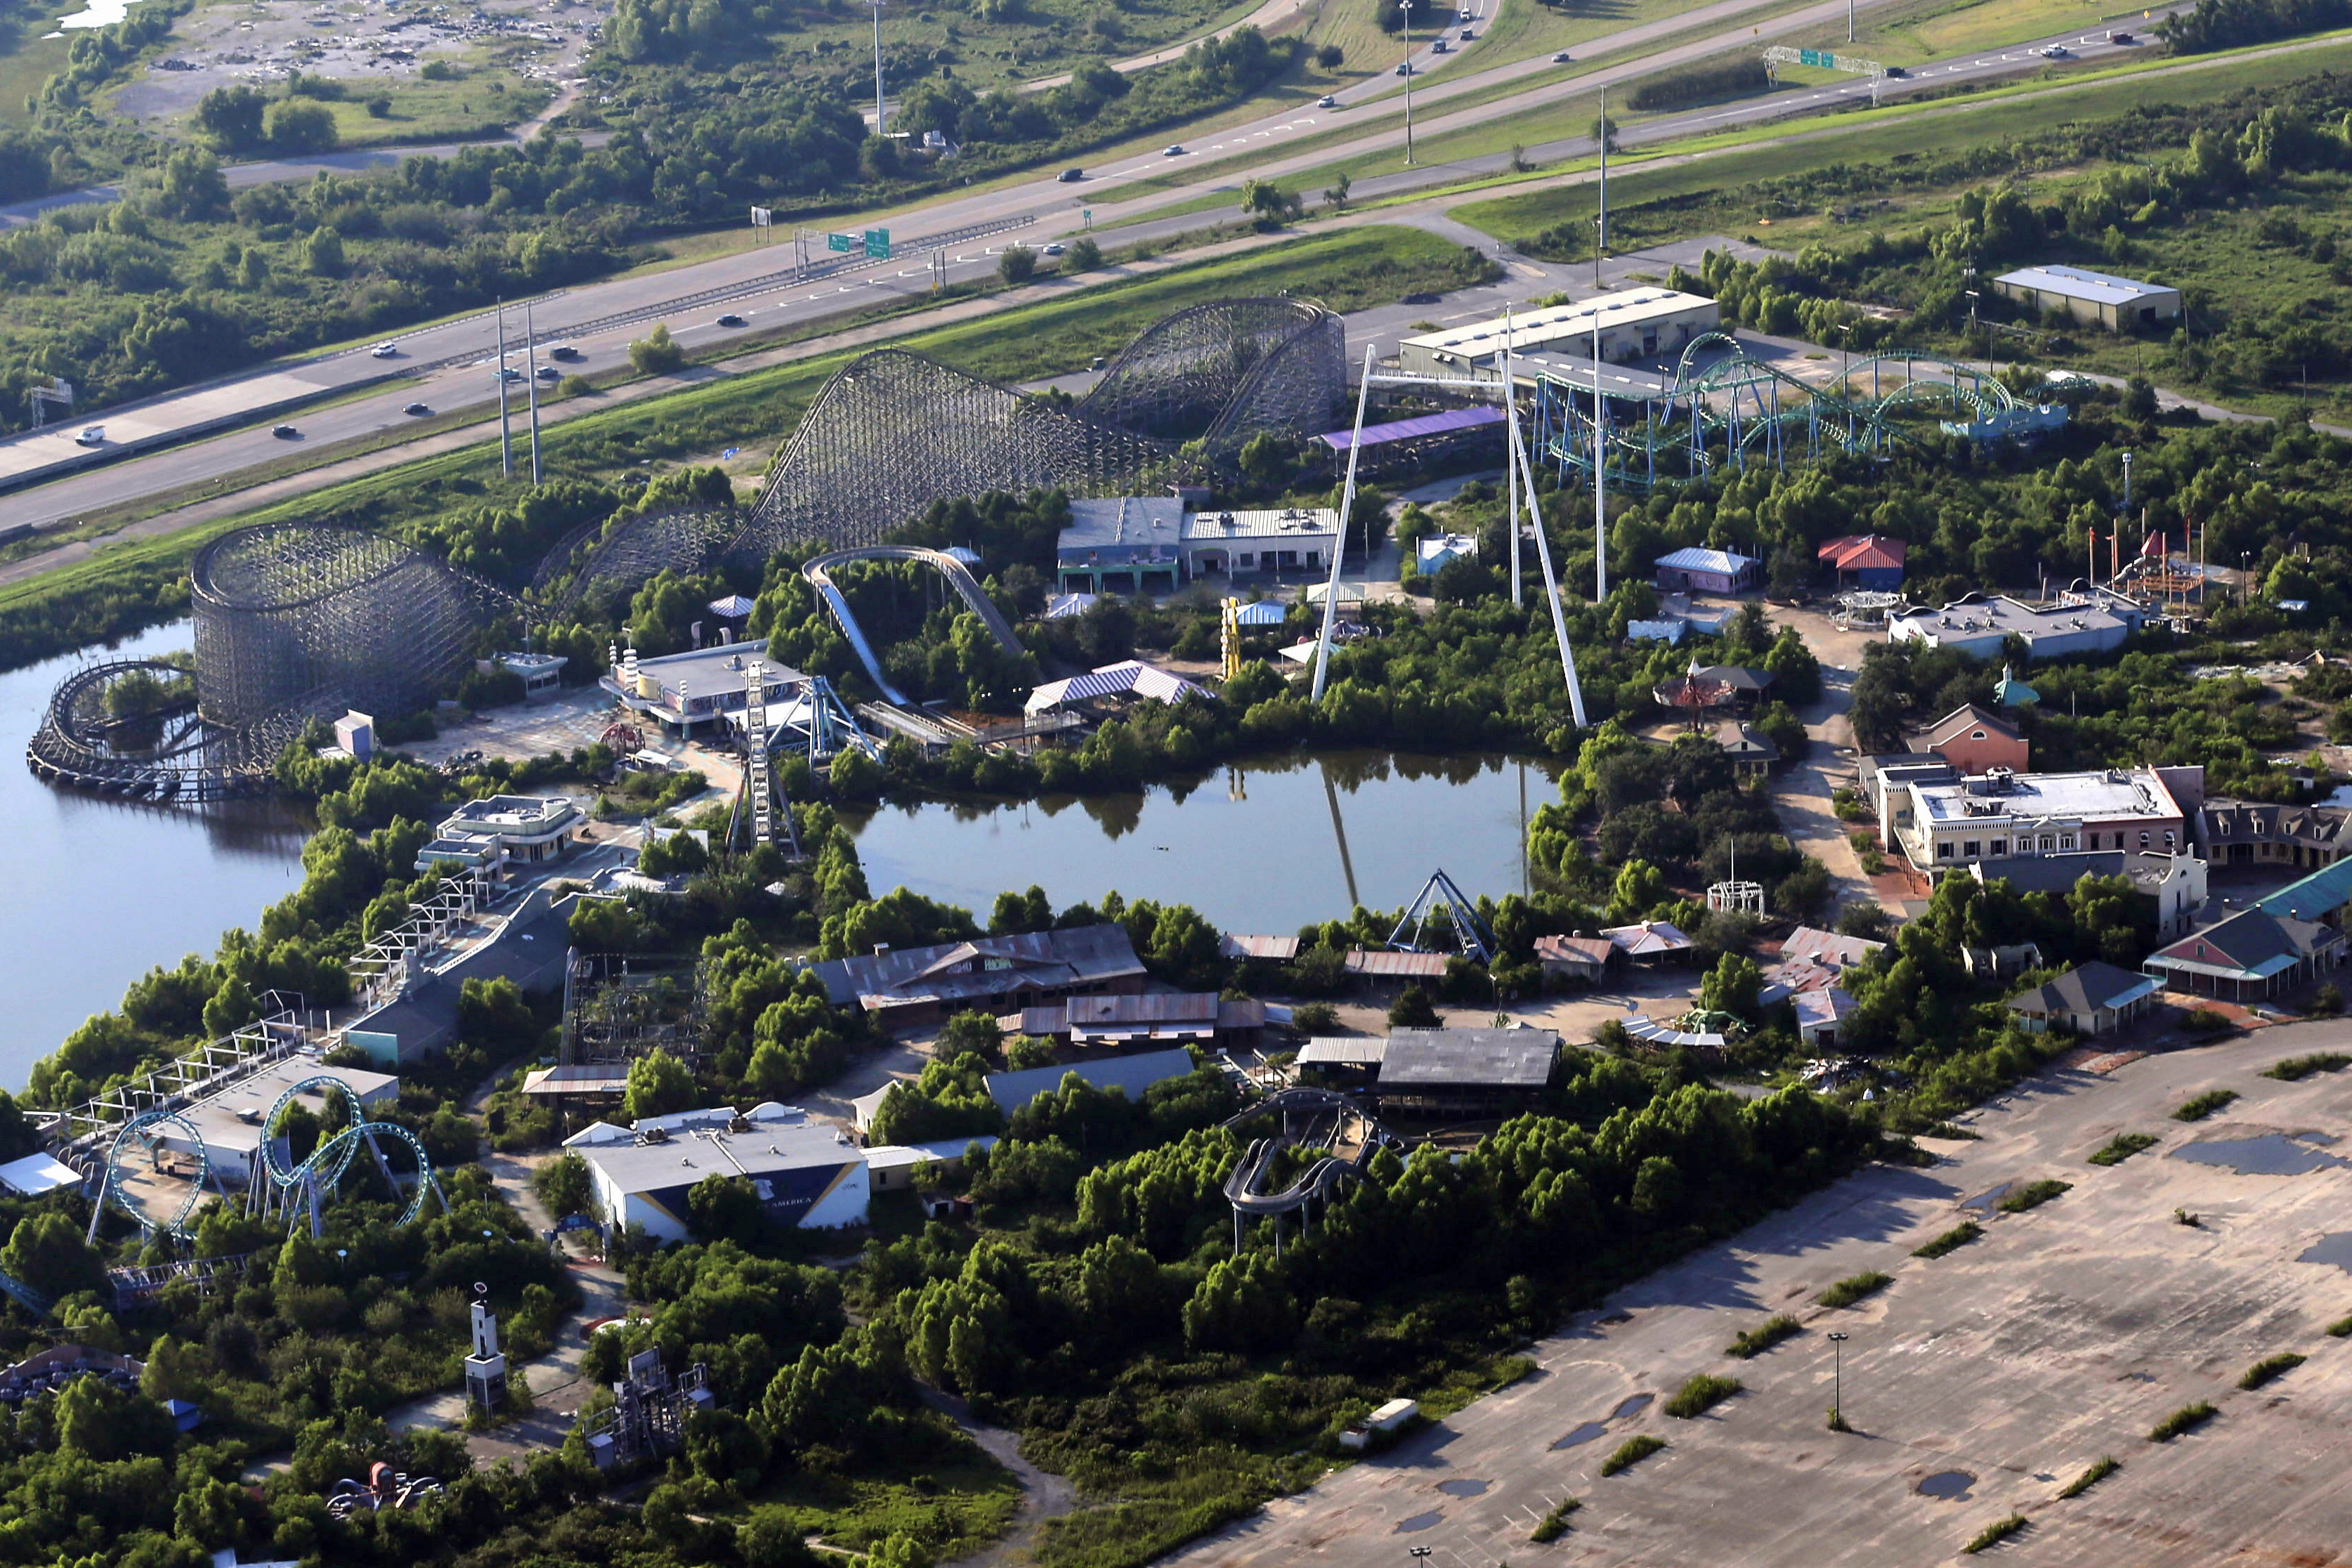 Officials Seek Developer For Abandoned Louisiana Theme Park Ktve Myarklamiss Com